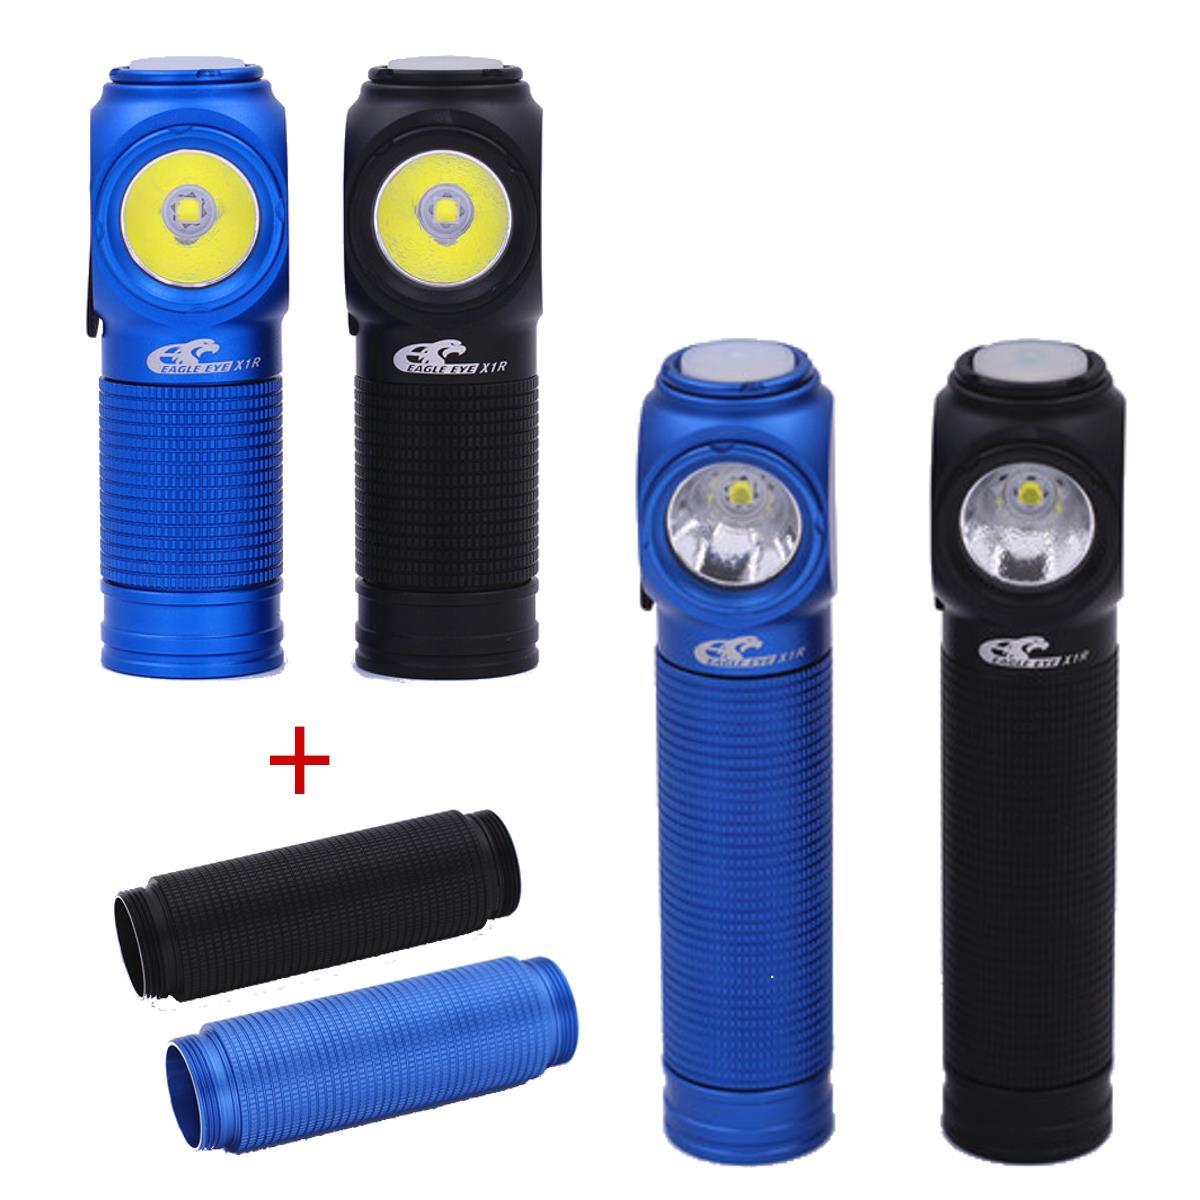 Eagle Eye X1R XP-L Cool White Yellow Natural Light USB Charging Portable Mini EDC LED 18350 Flashlight Torch with 18650 Tube